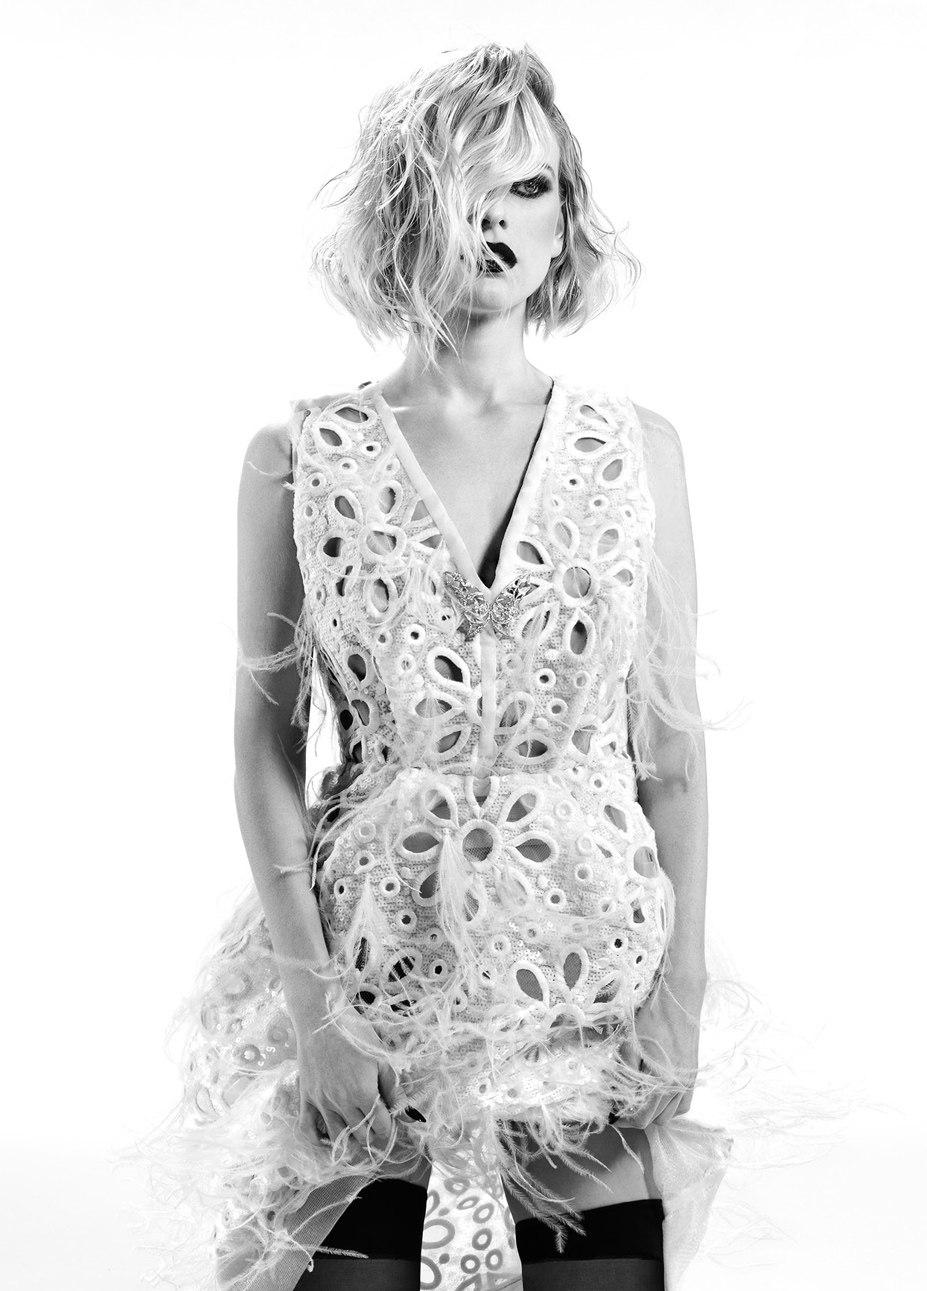 модель Alice Eve / Элис Ив, фотографы Stevie and Mada